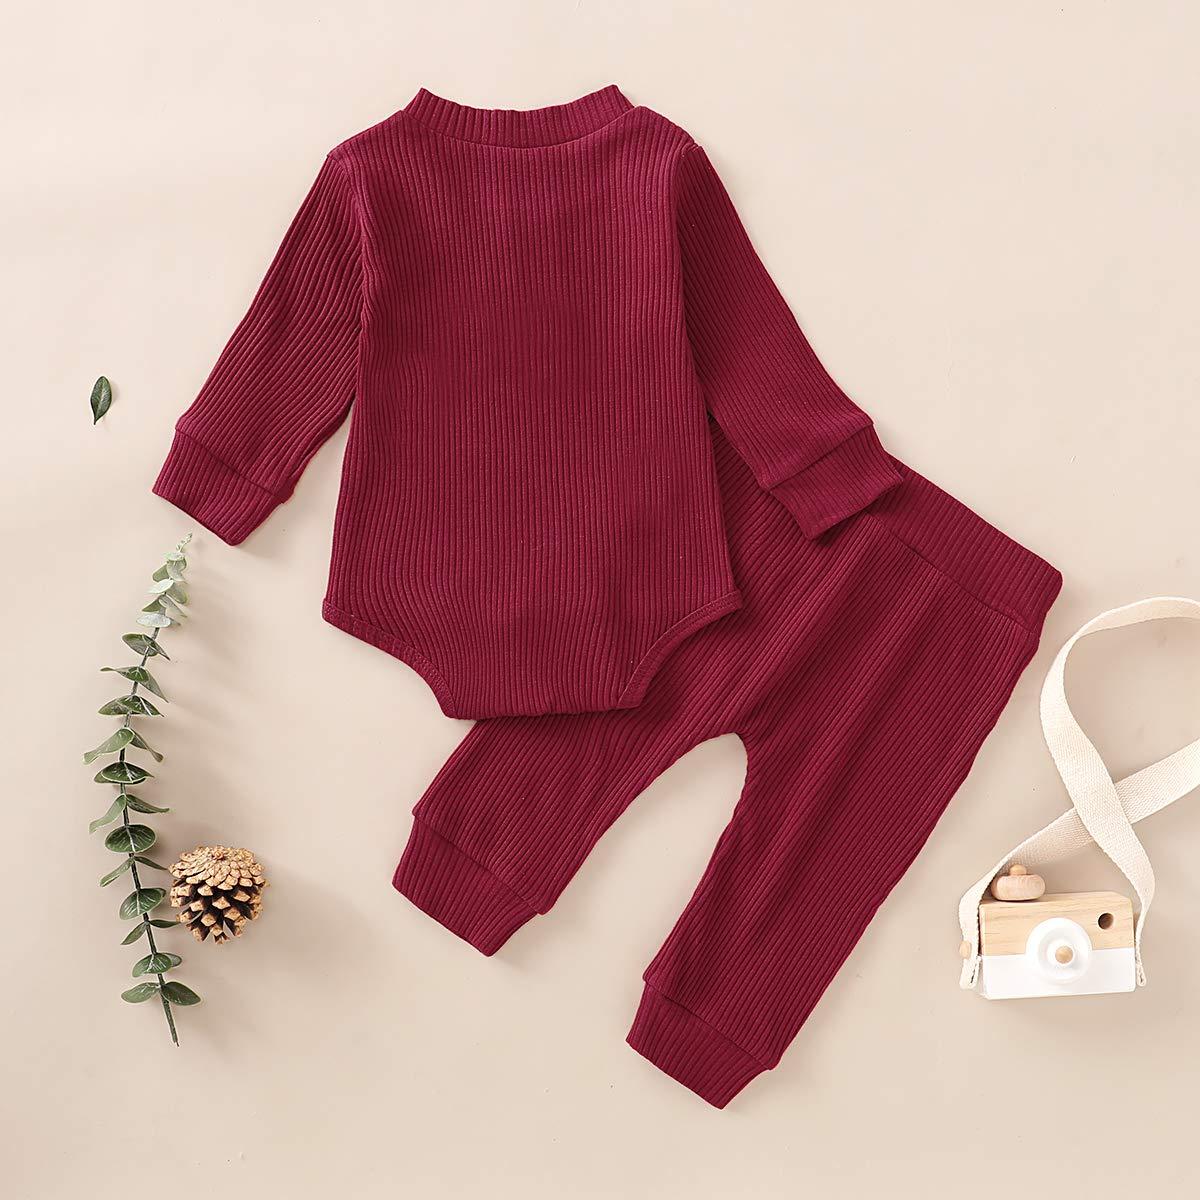 Newborn Baby Boy Girl Pajamas Snug-Fit 2-Piece Pjs Set Clothes Organic Cotton Long Sleeve Romper Pants Outfit